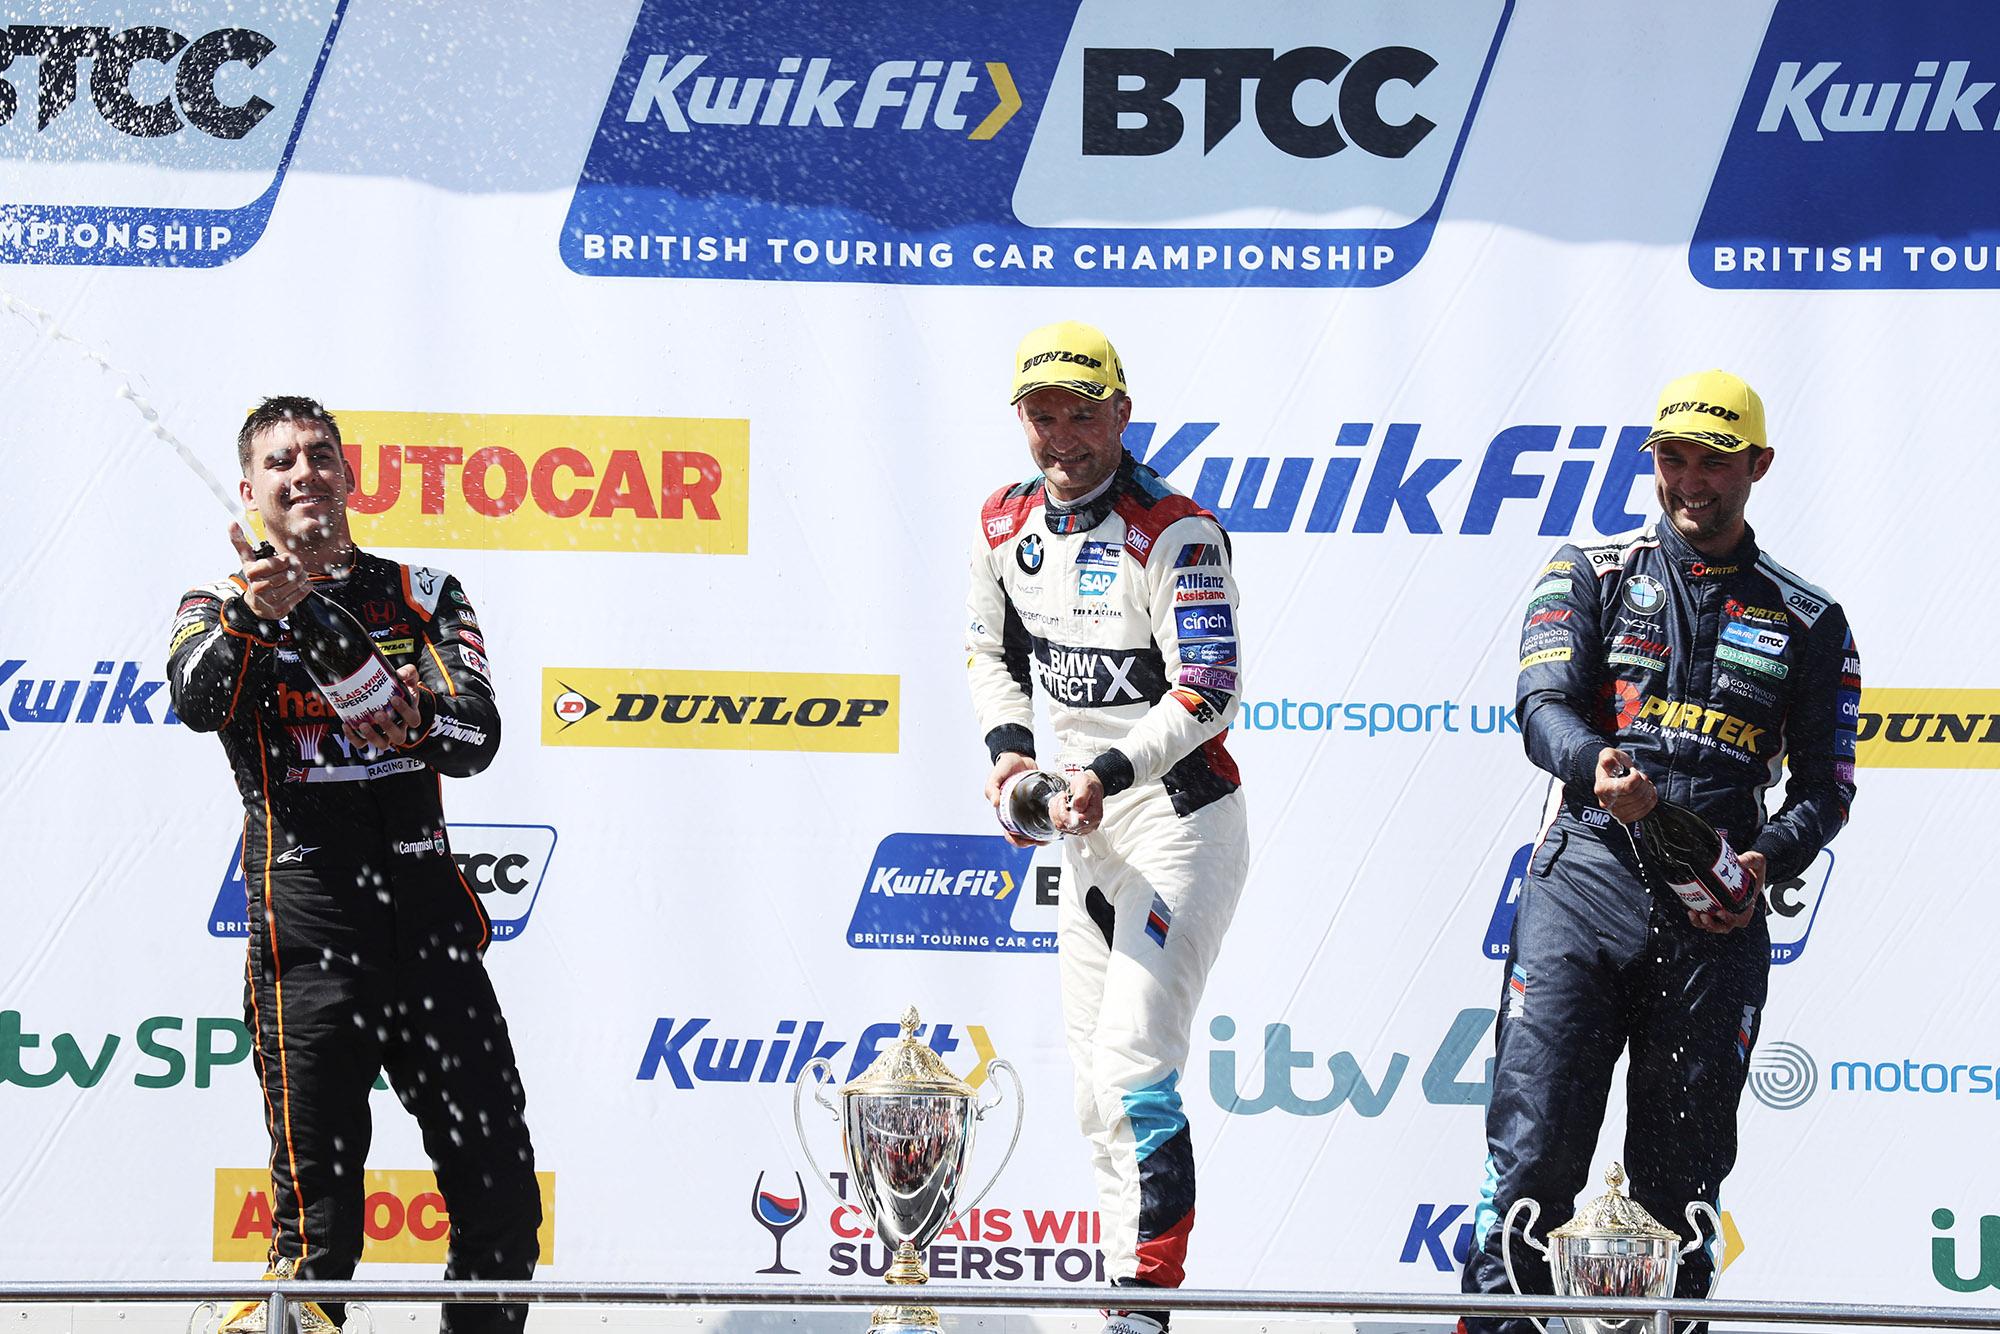 2019 BTCC Oulton Park podium